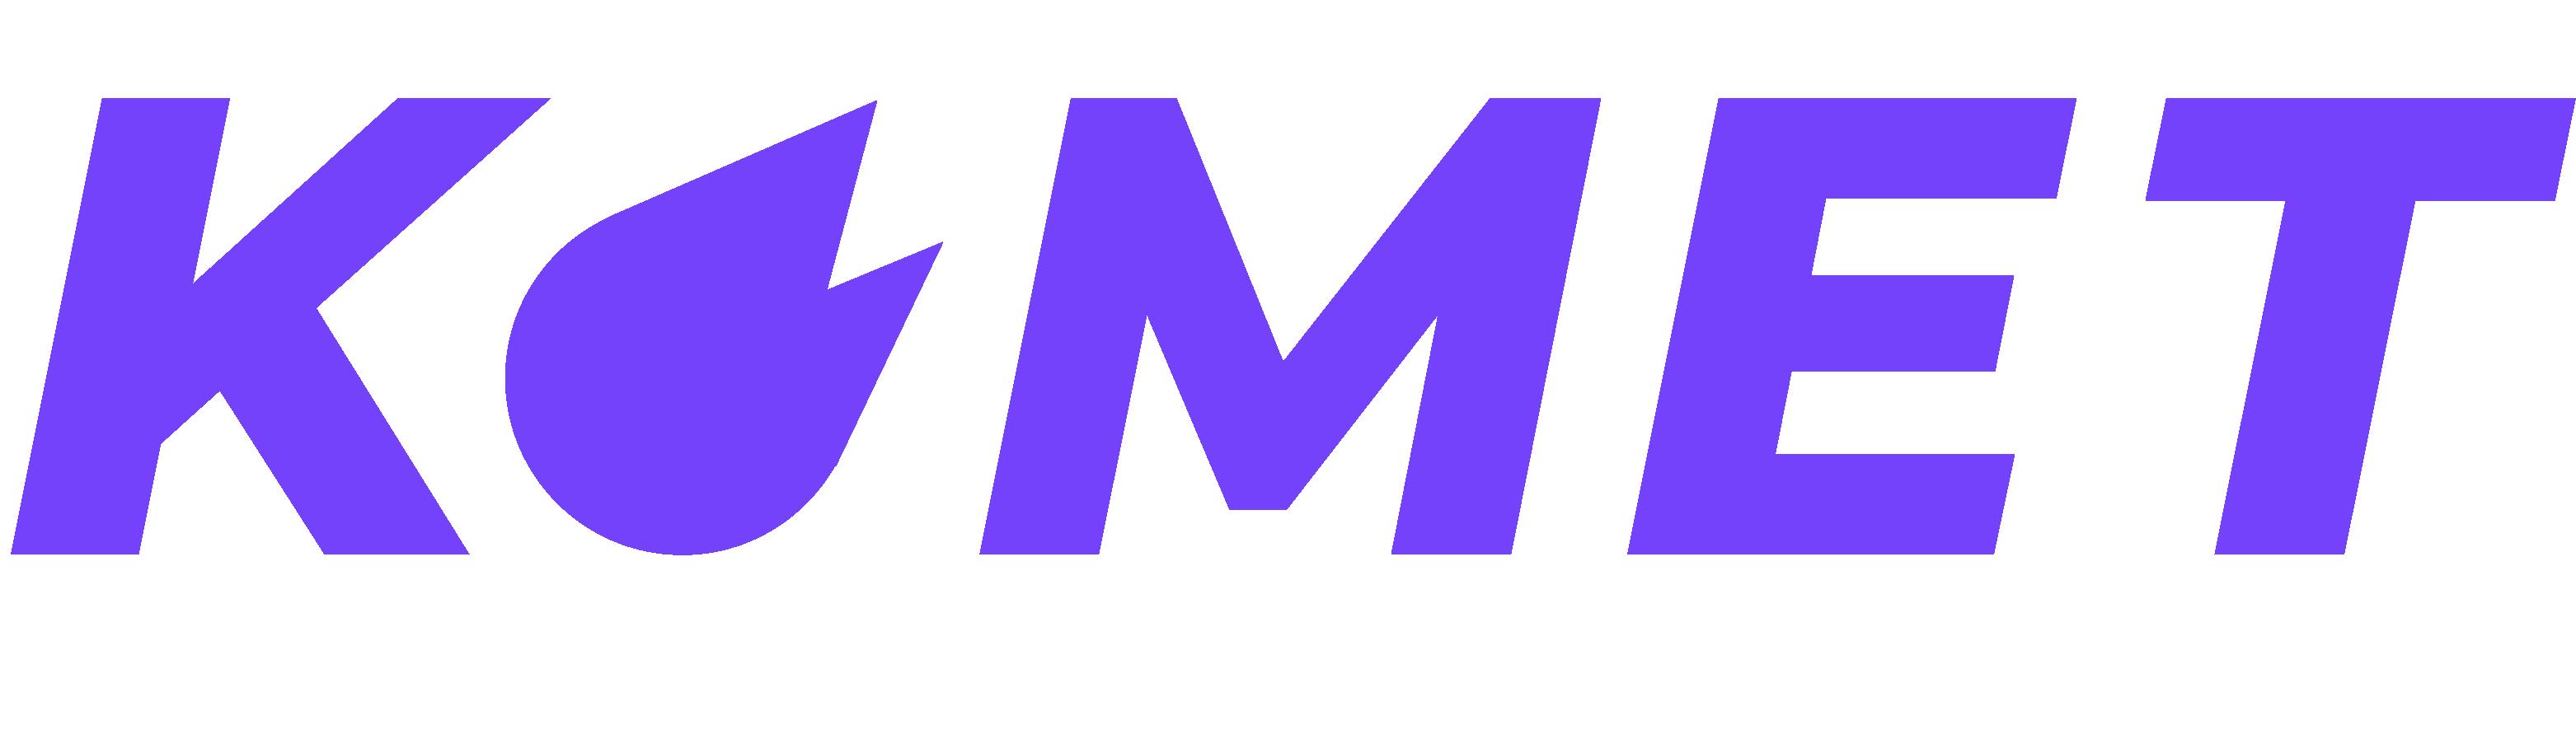 """Komet"" in purple"